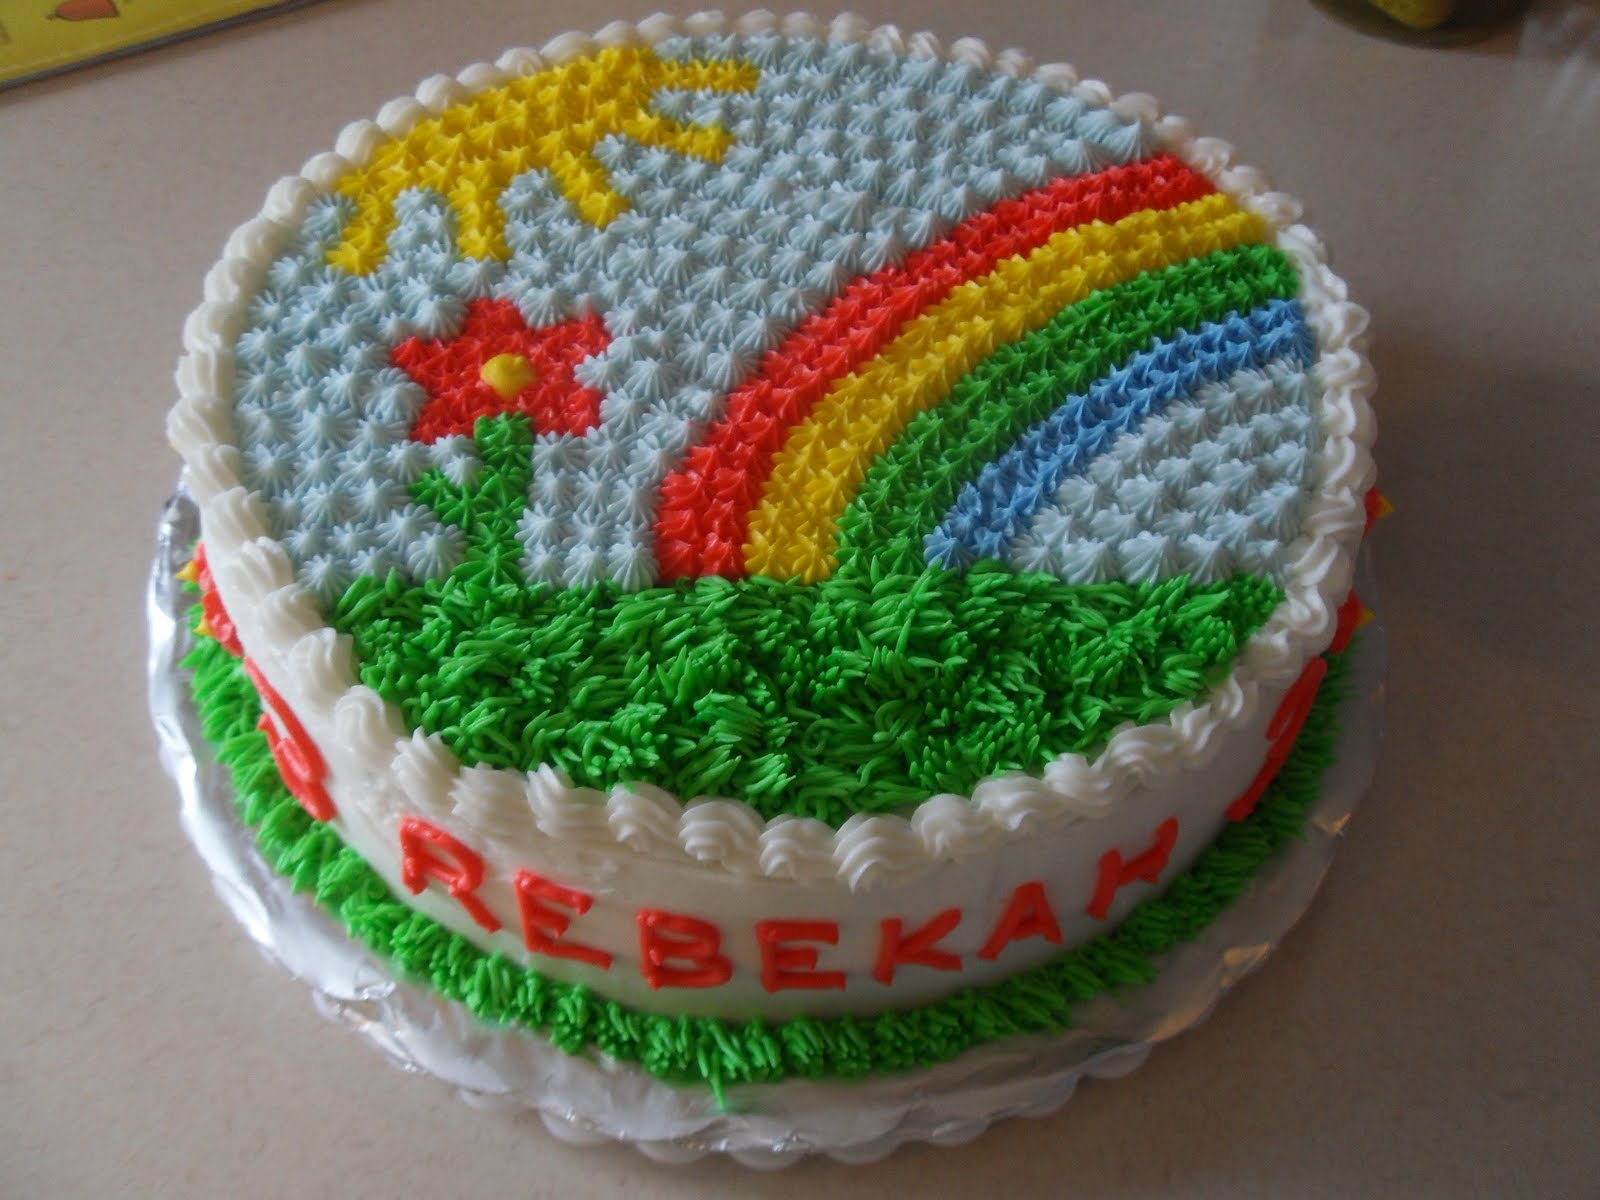 Rainbow Cake Recipe Joy Of Baking: Simple Joy Crafting: Rainbow & Flower Birthday Cake